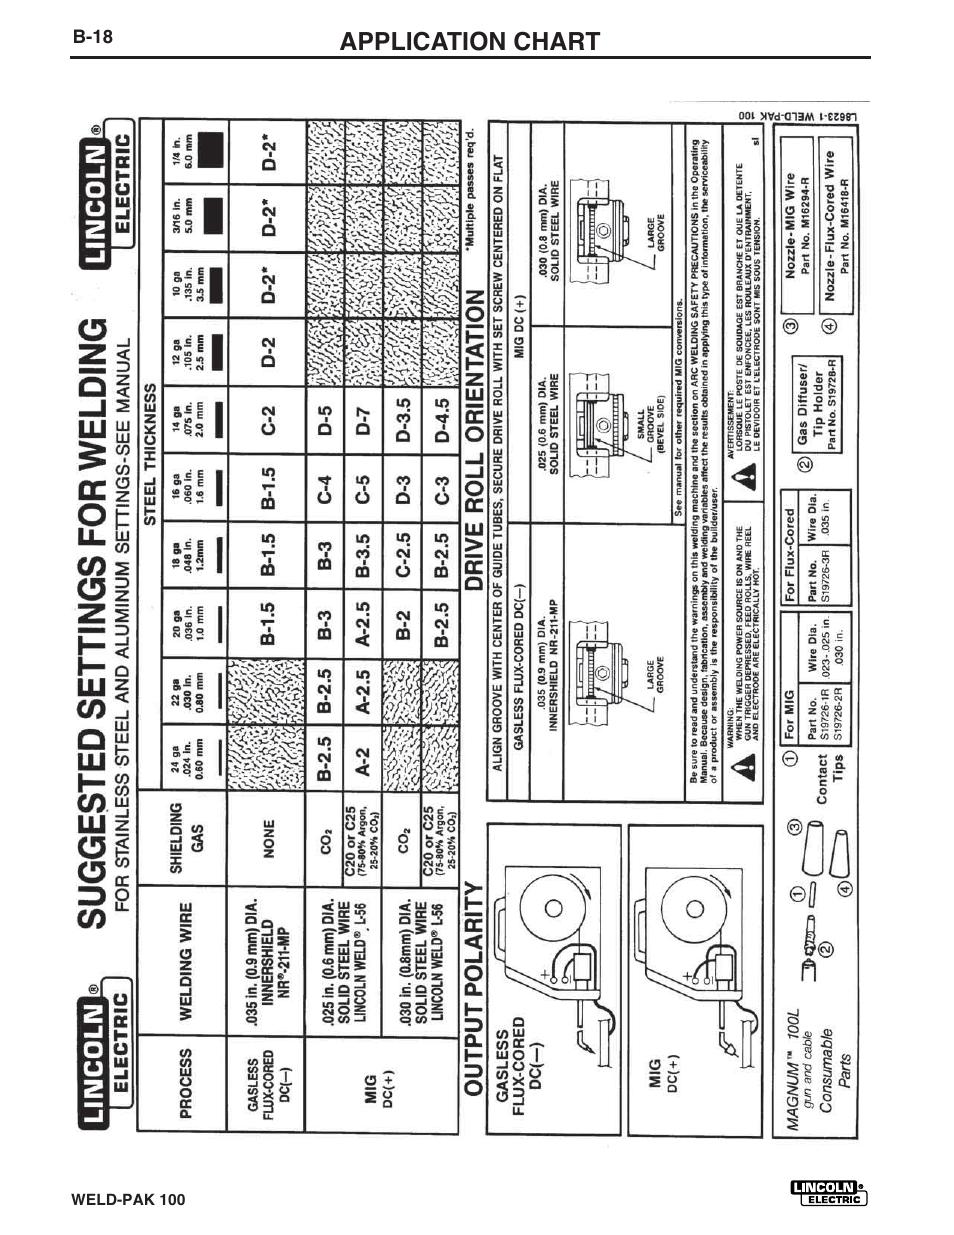 Application Chart